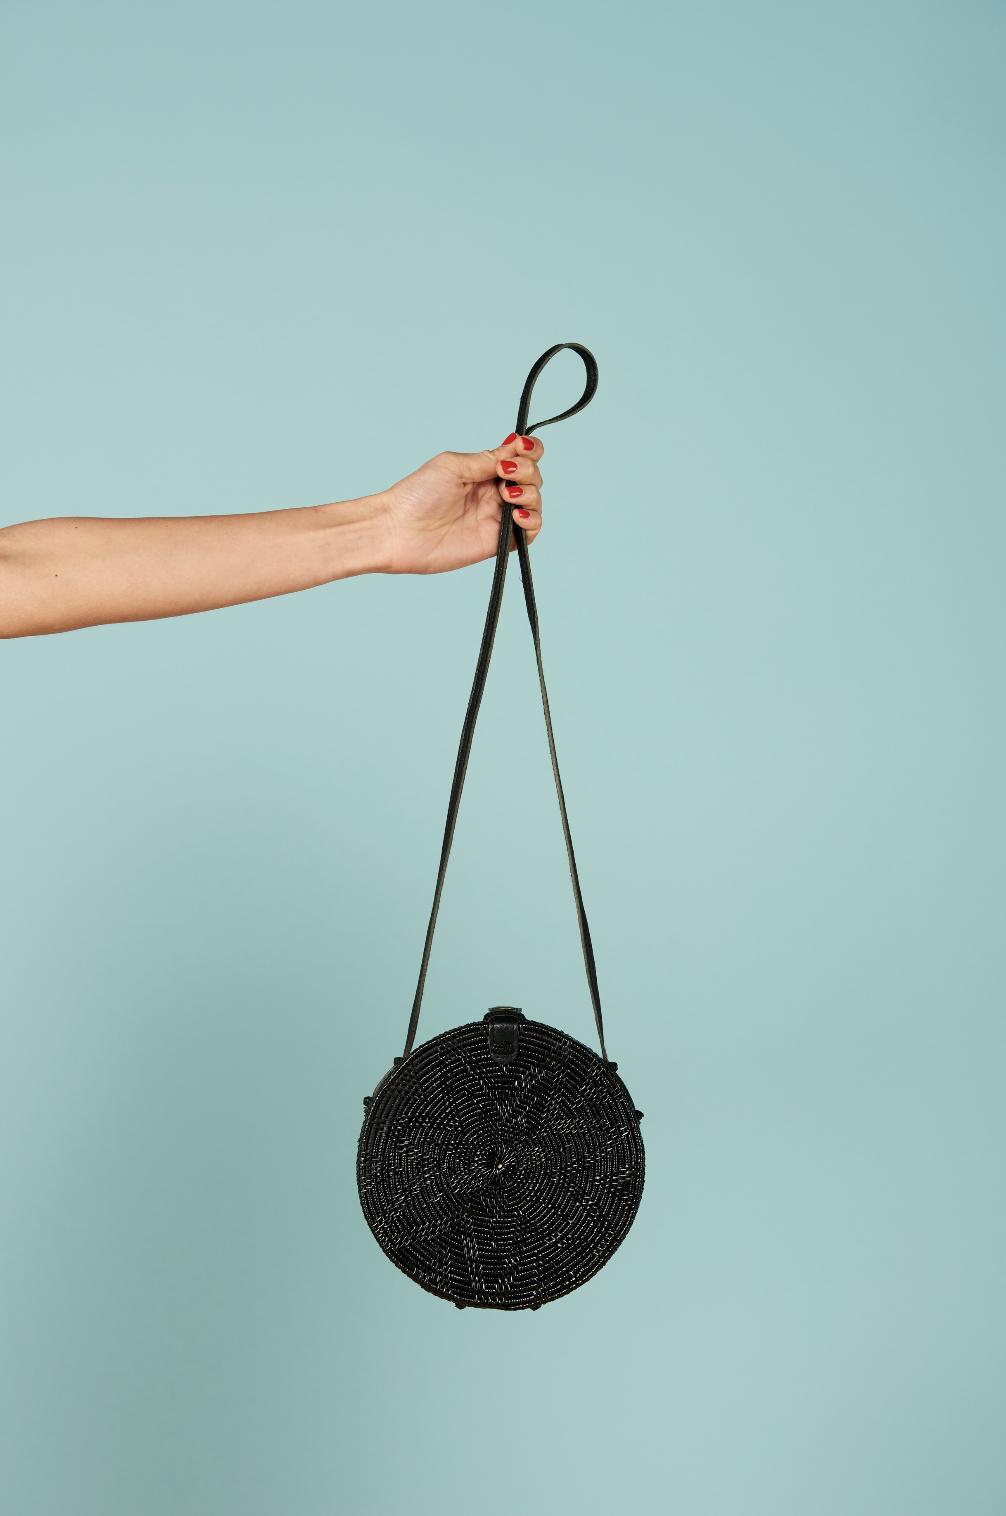 Round Woven Purse - $132